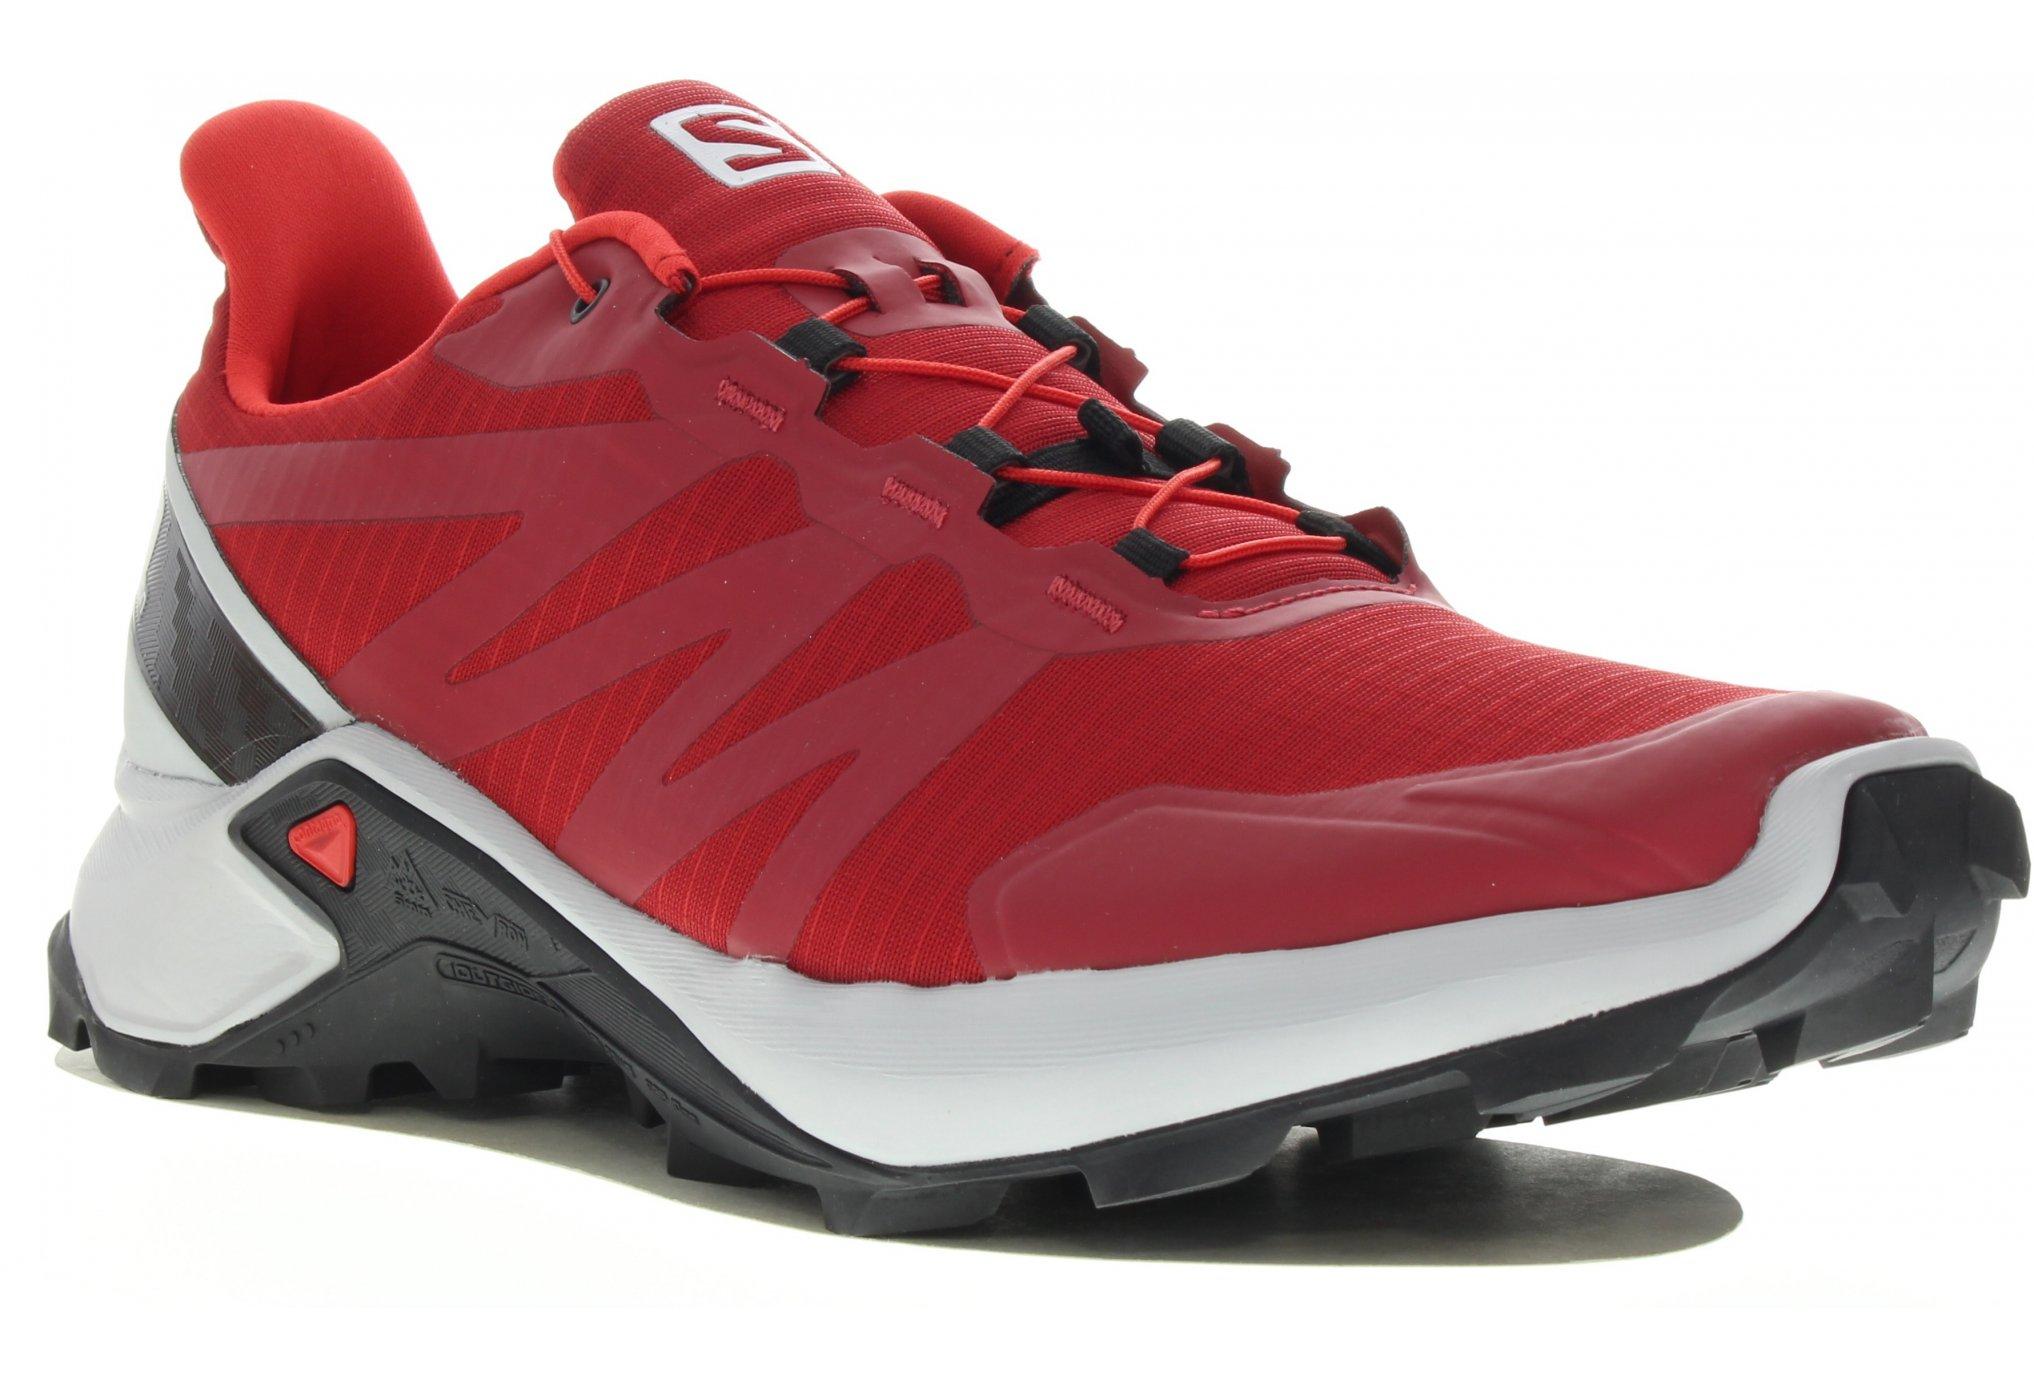 Salomon Supercross Chaussures homme